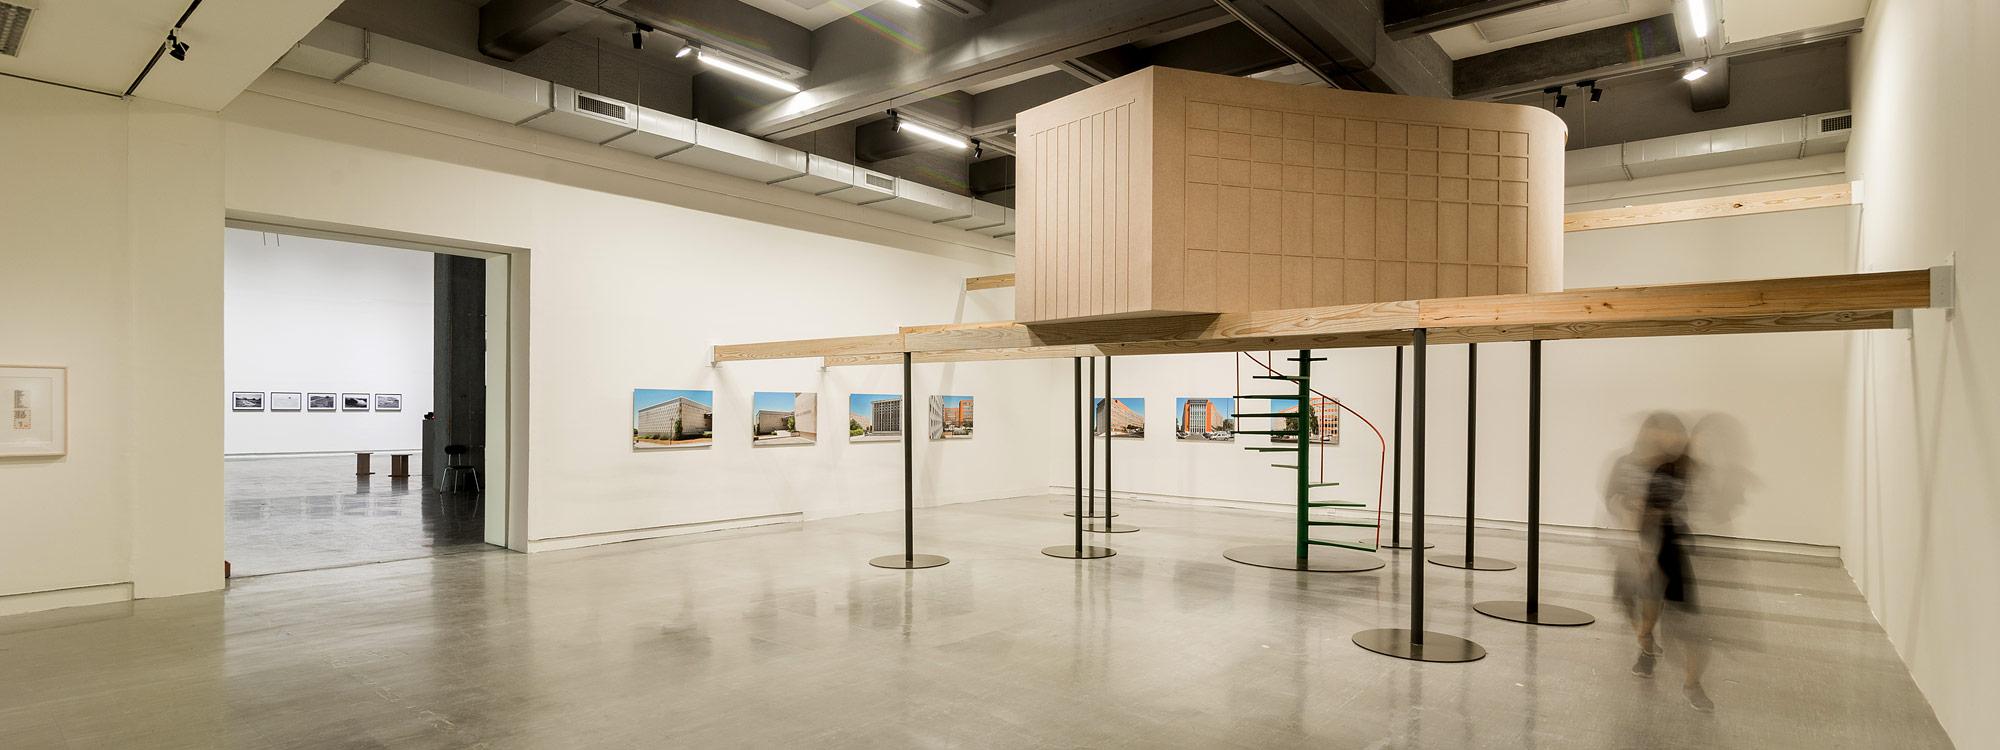 Taipei Biennial 2016: Photo tour